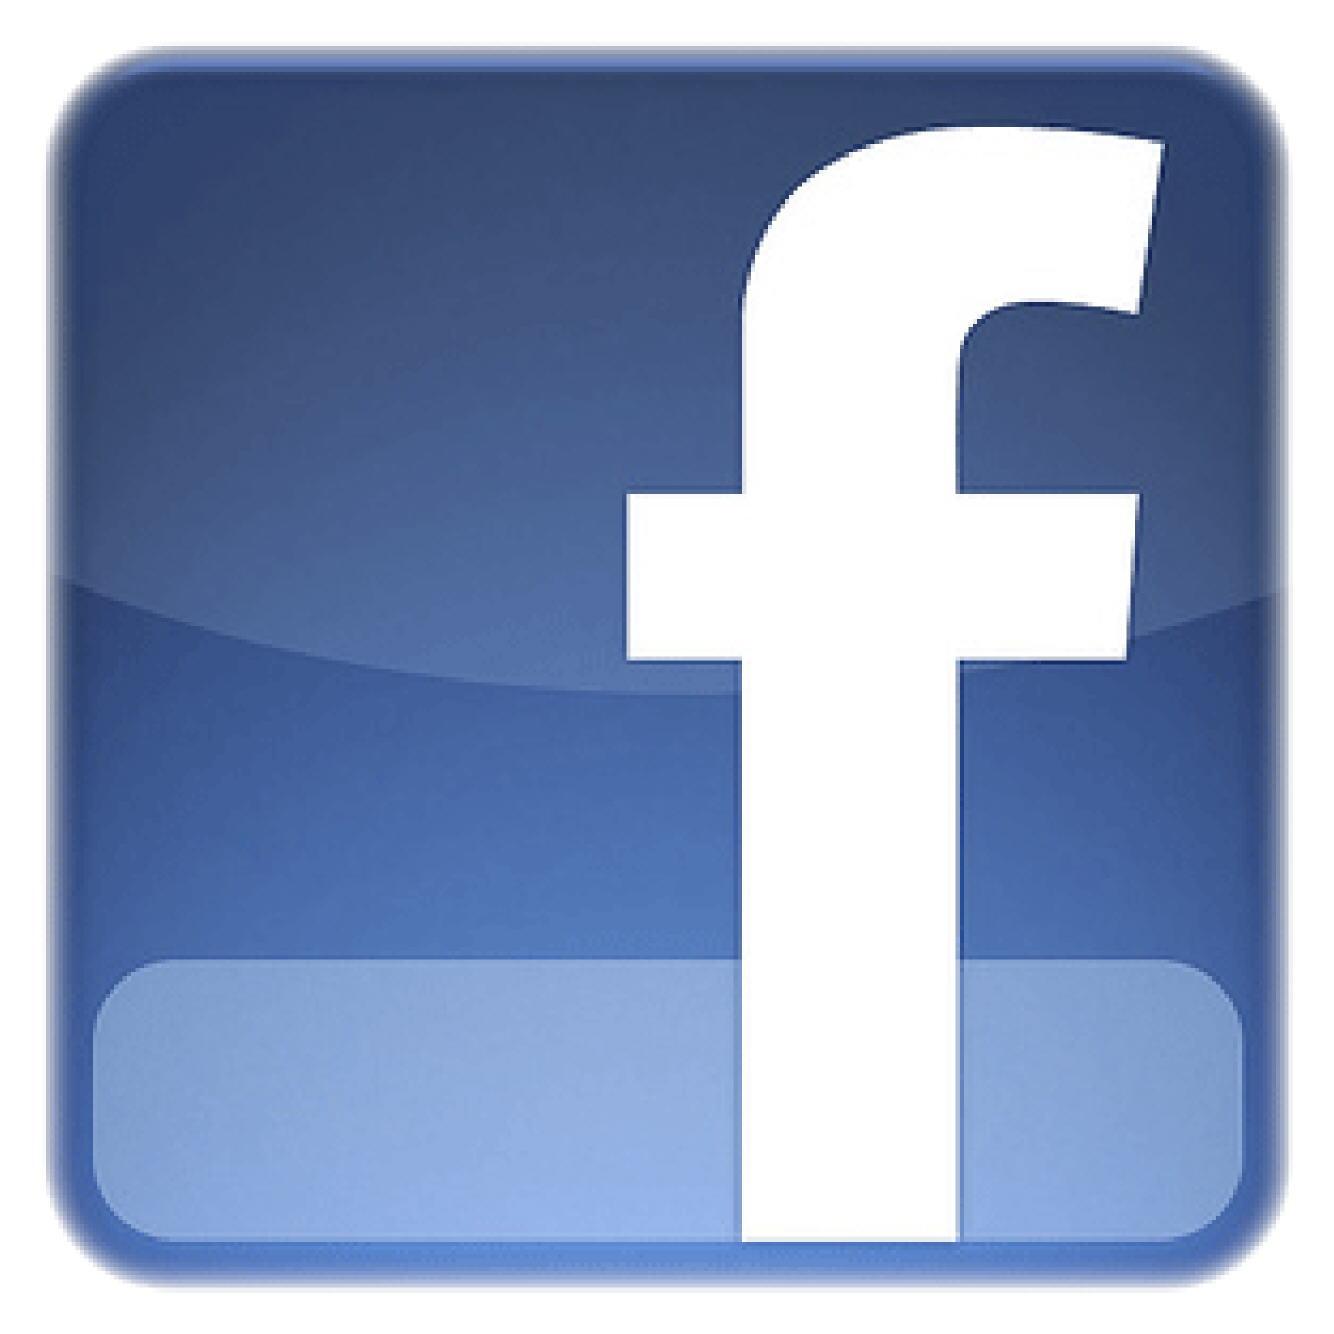 Create a Facebook cover photo